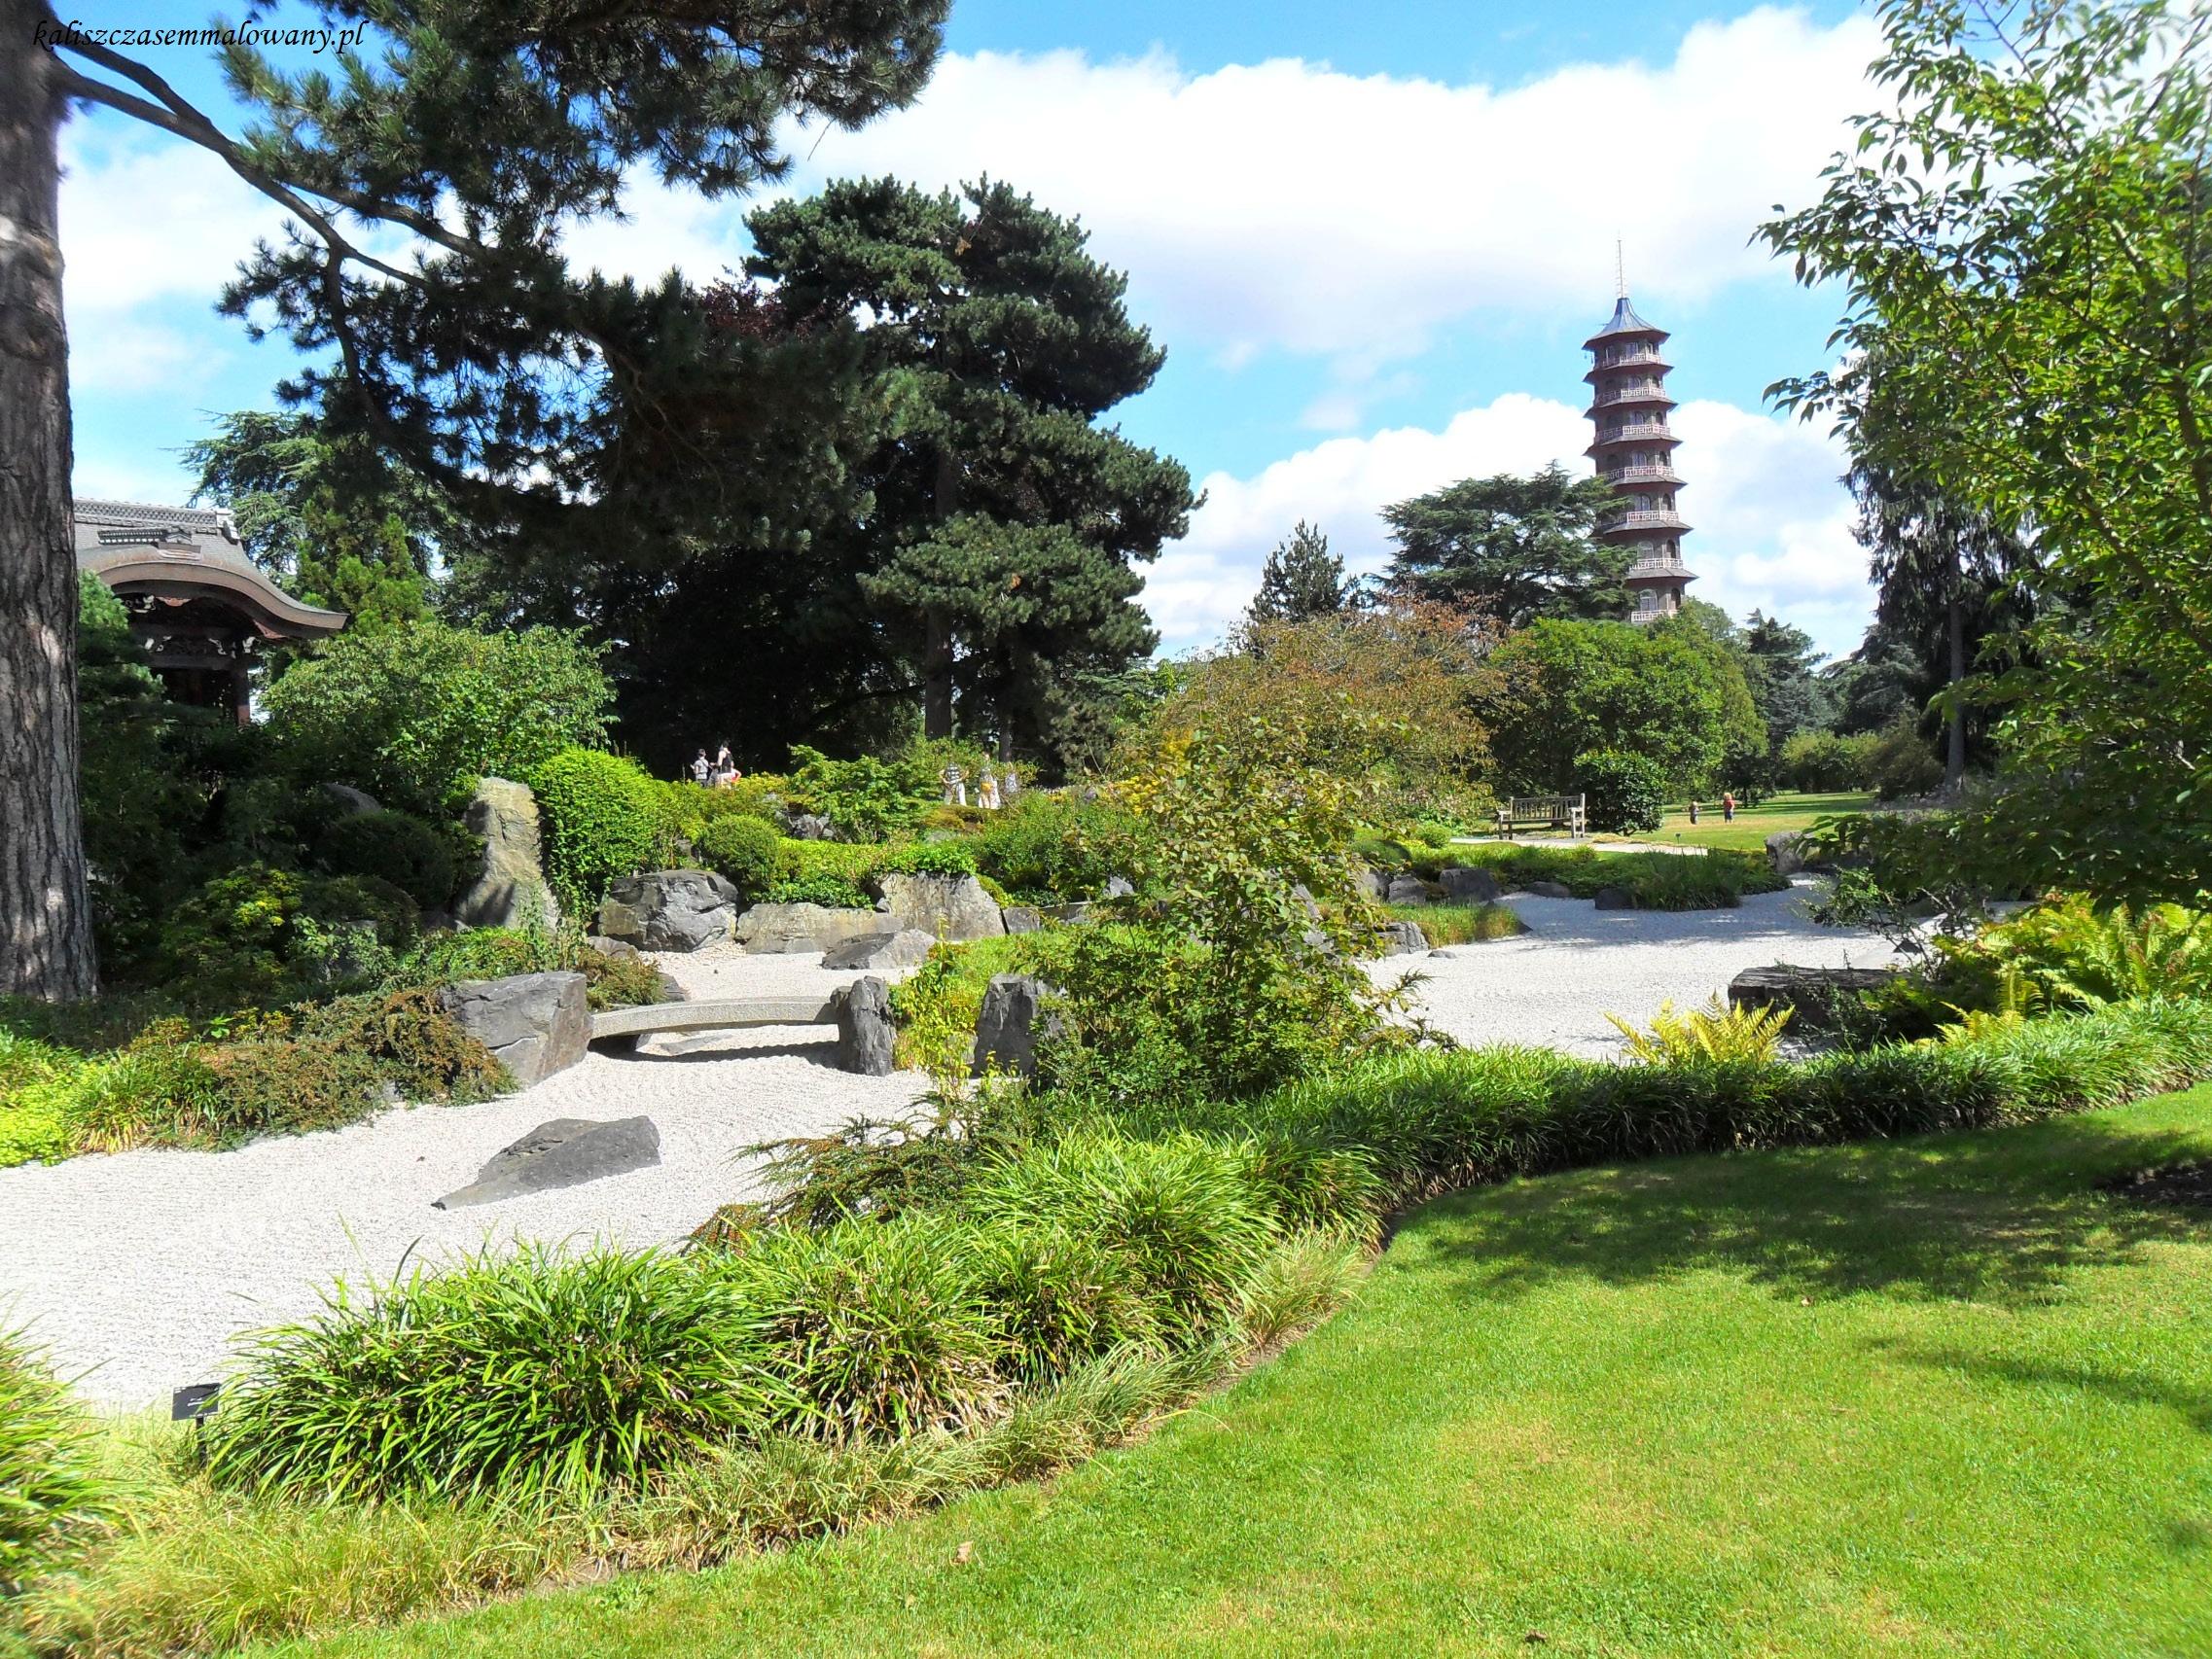 Kew_Garden-19